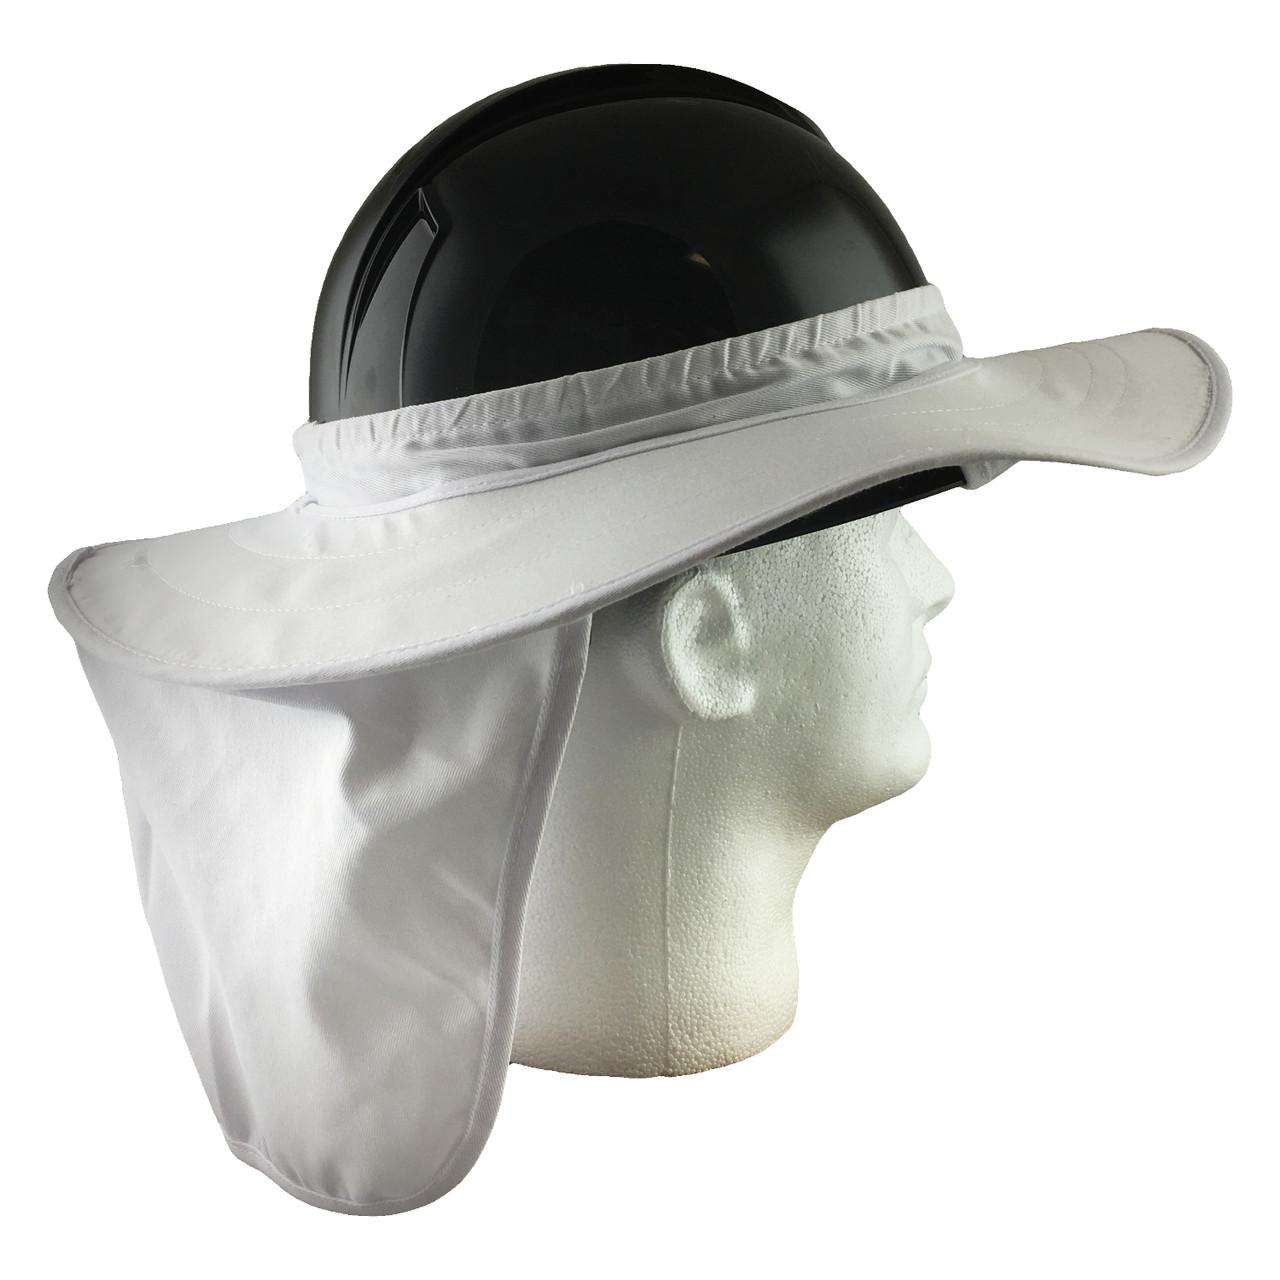 6aab692e8 Pyramex Hard Hat Brim with Neck Shade - White